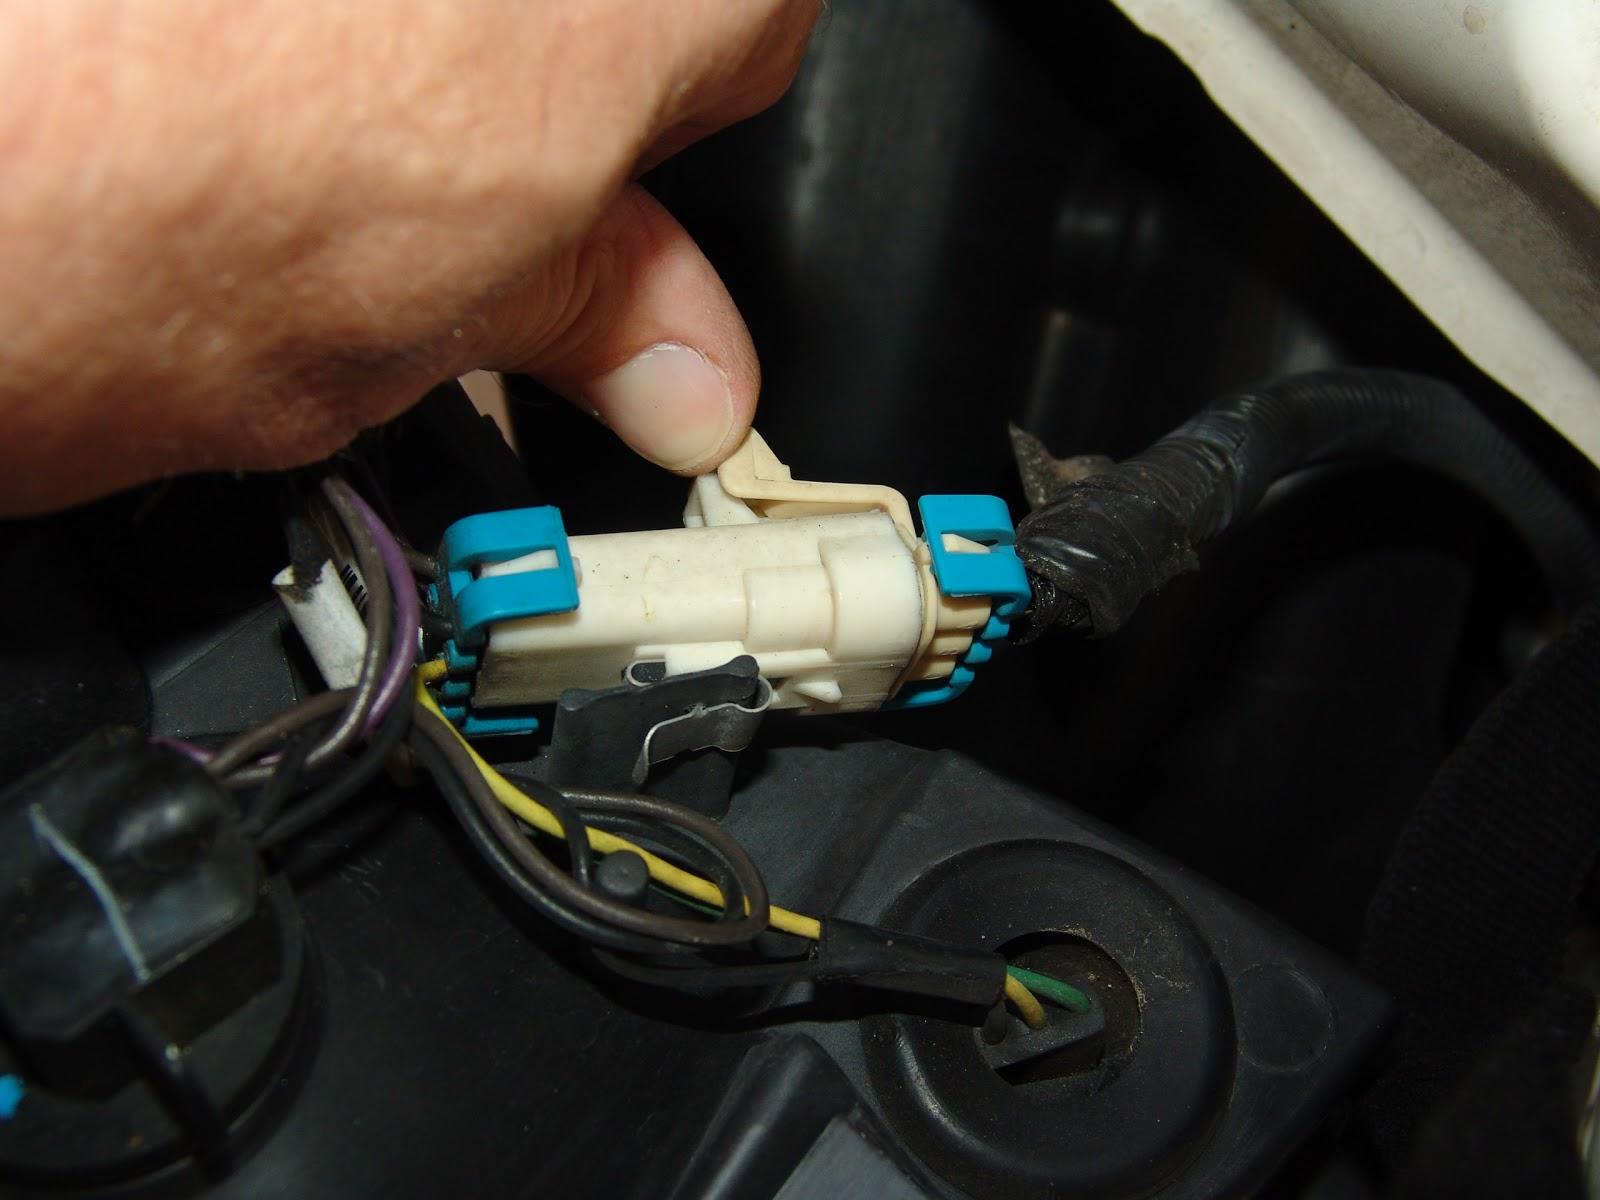 Sparky U0026 39 S Answers  2007 Pontiac G6  Changing The Headlight Bulb  U0026 Harness Connector